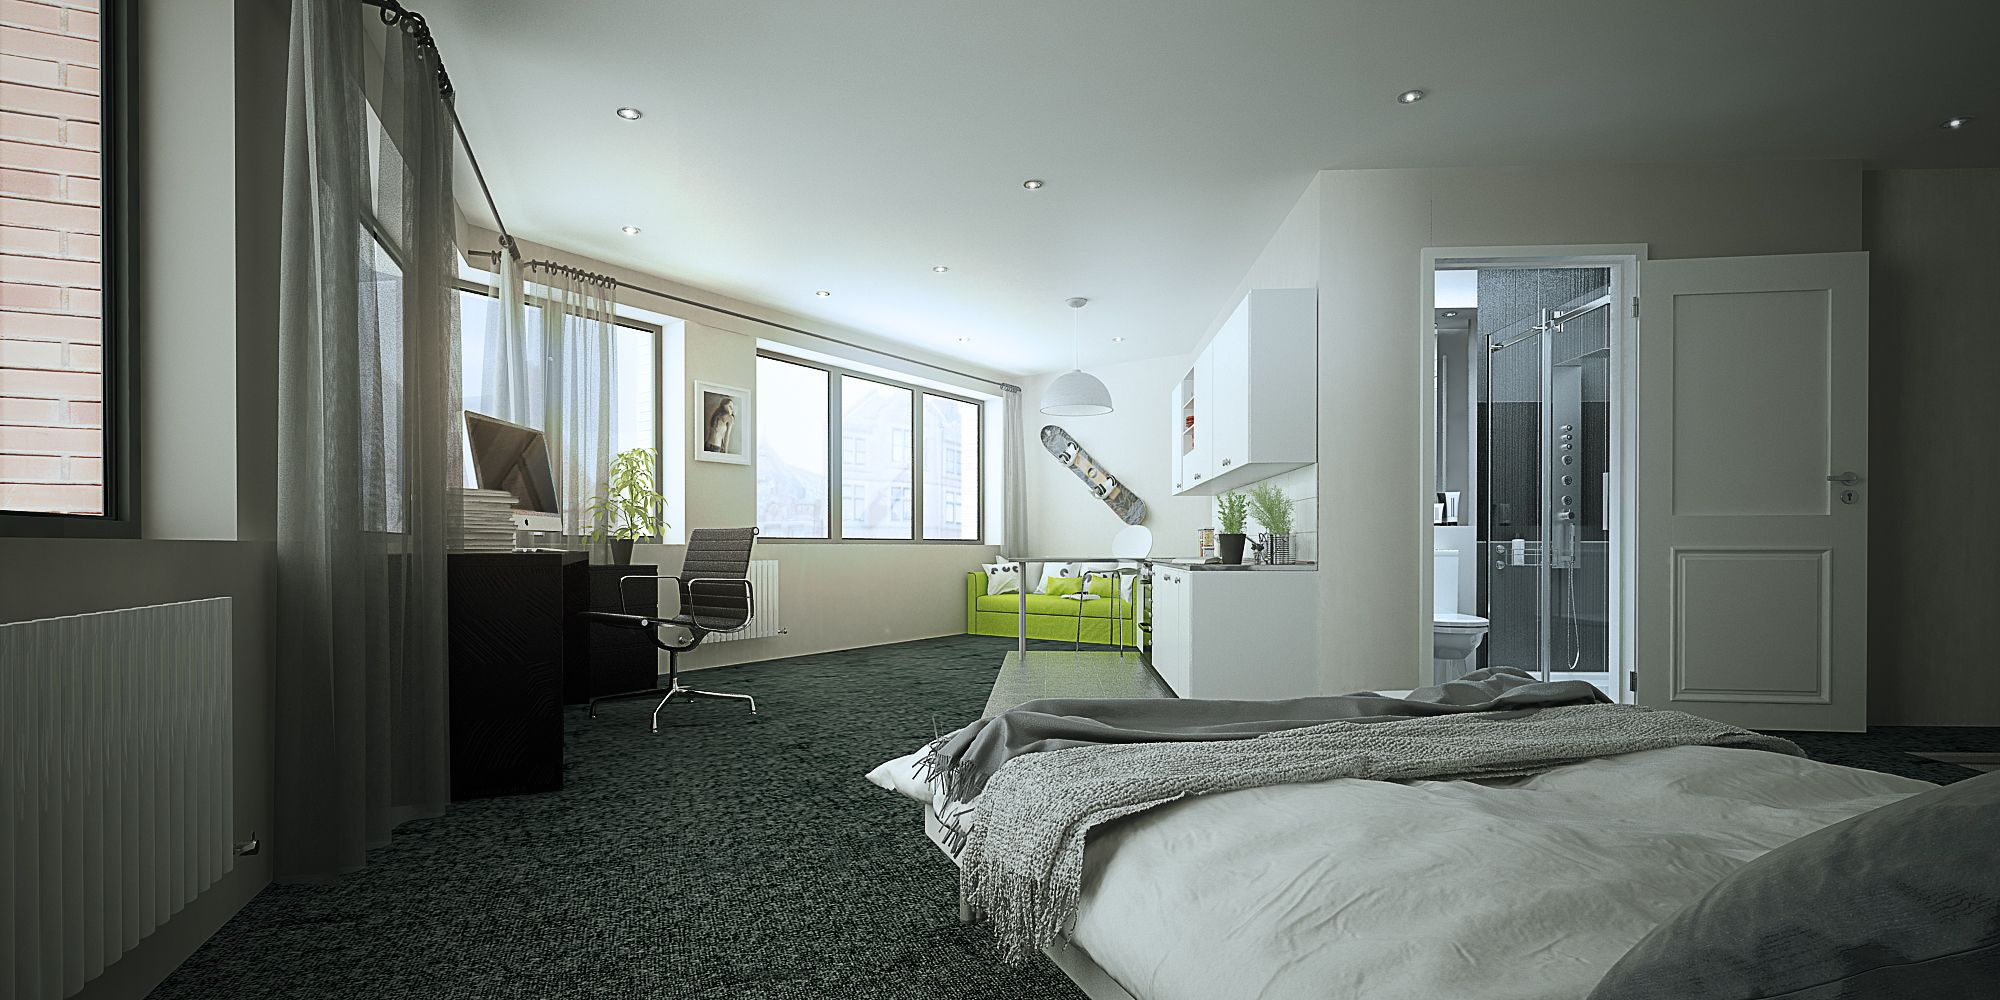 CGi Interior Design Visuals For Hydrogen Student Accommodation In  Nottingham.